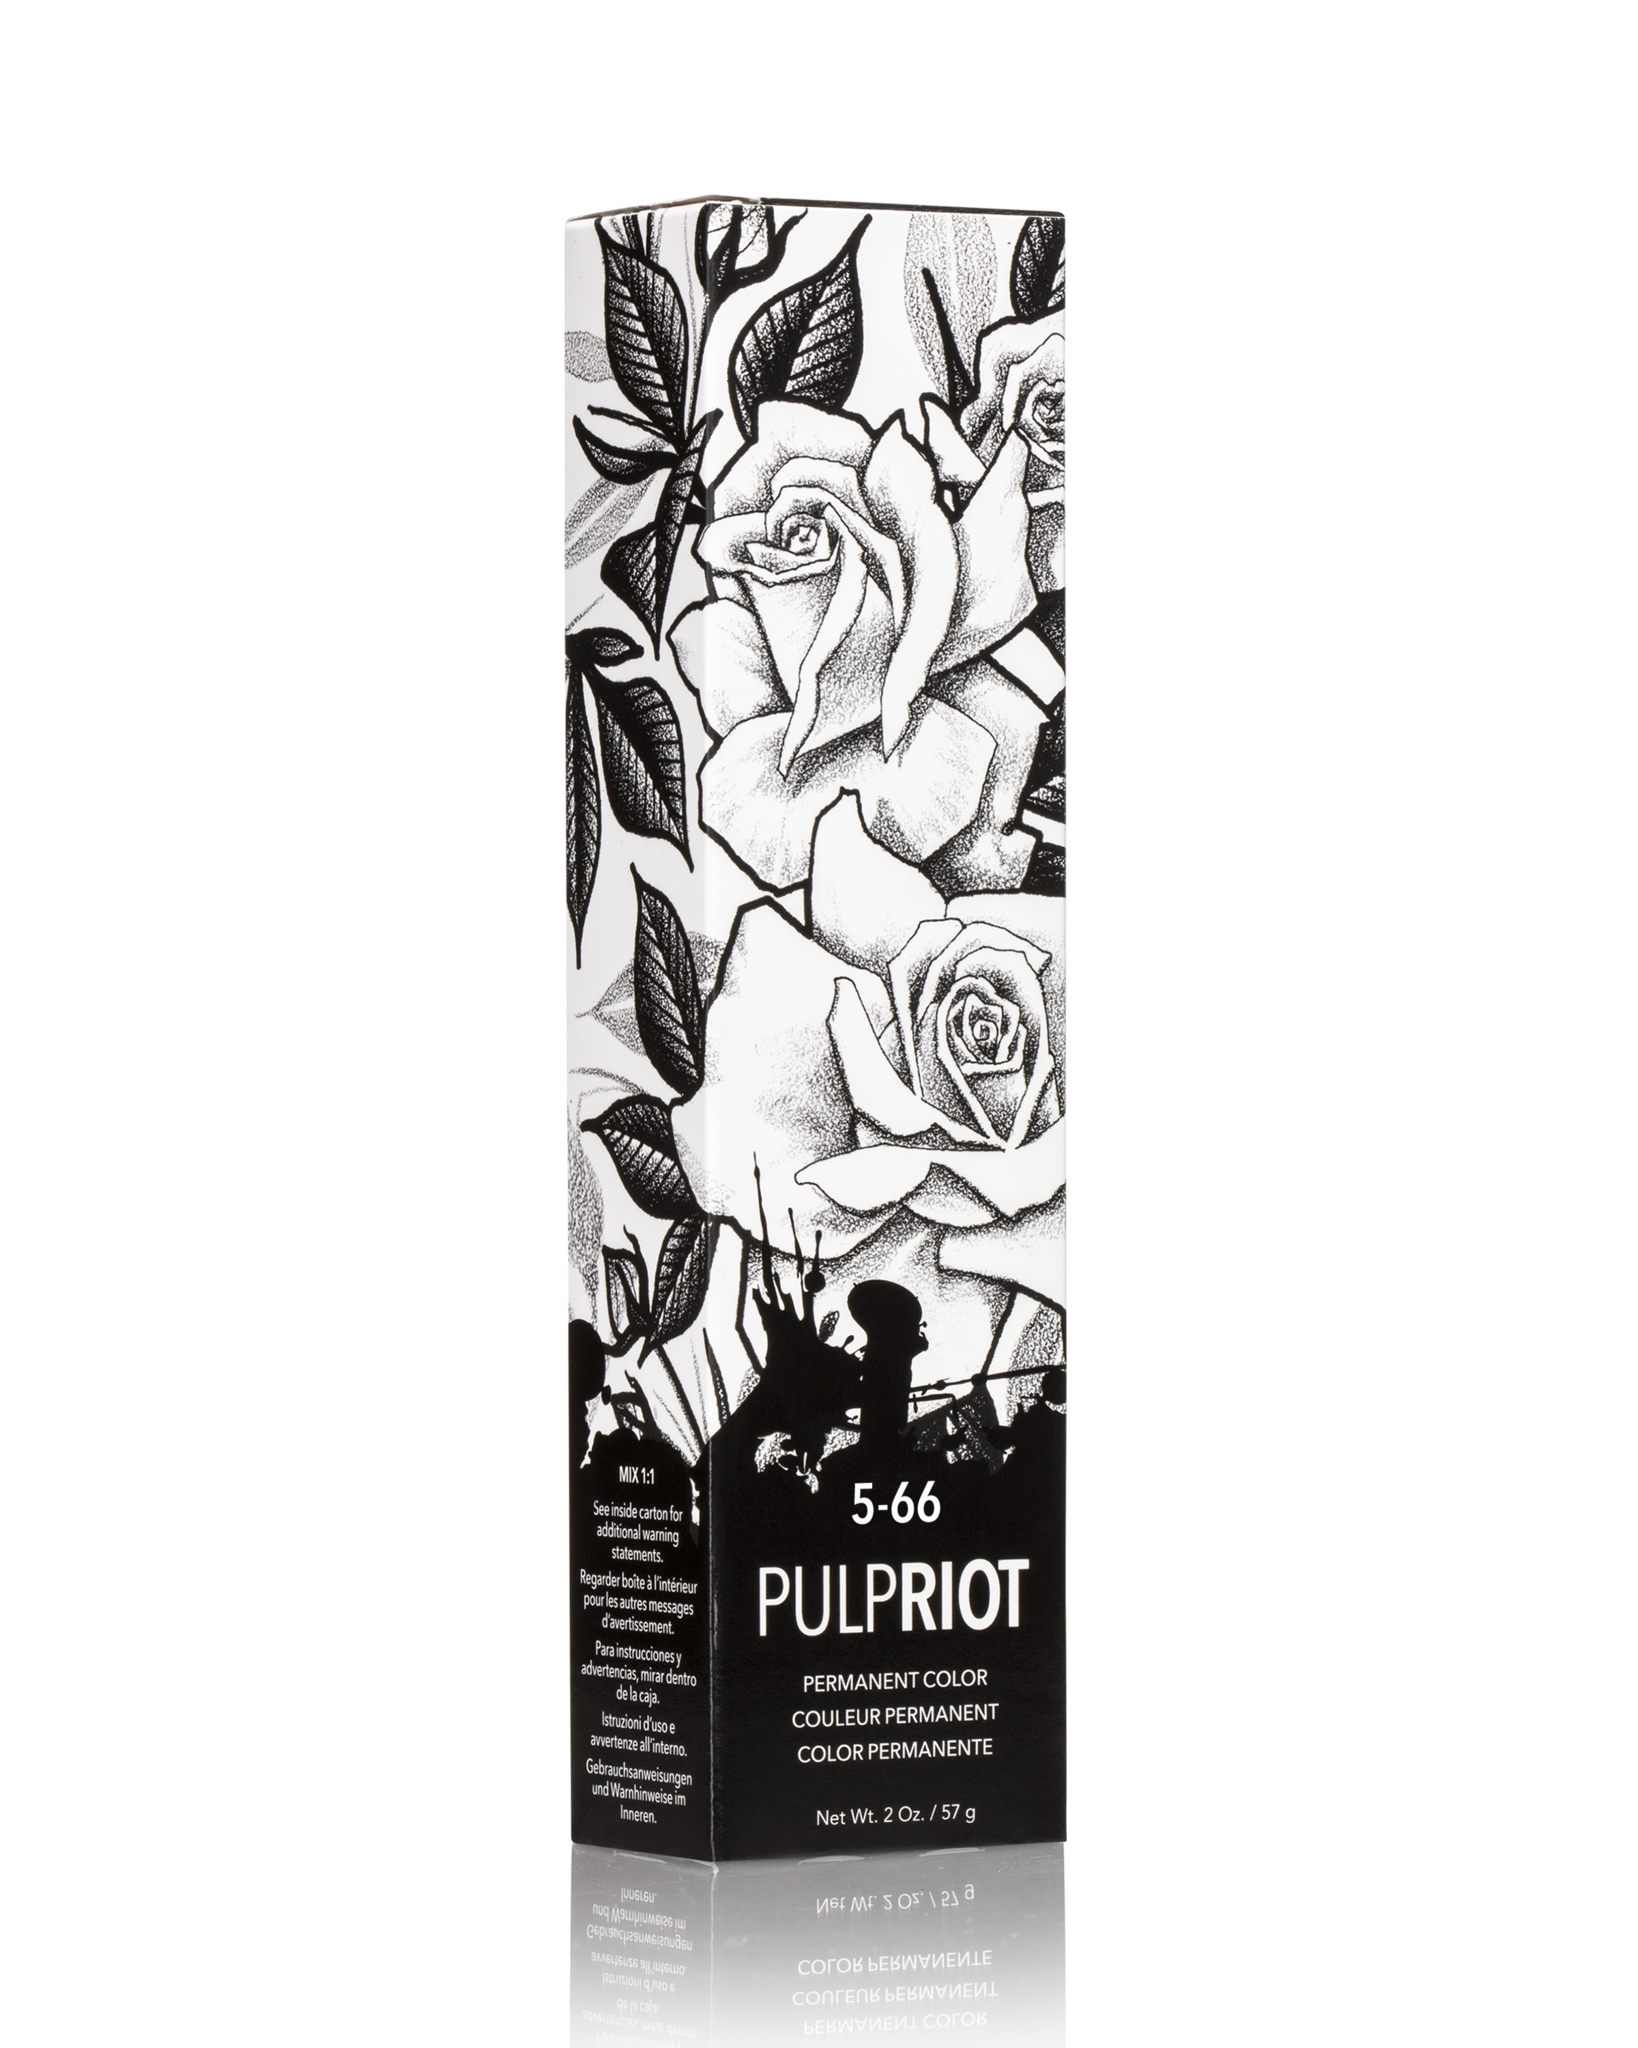 Pulp Riot PULP RIOT FACTION 8 ROUGE INTENSE/RED INTENSE 5-66